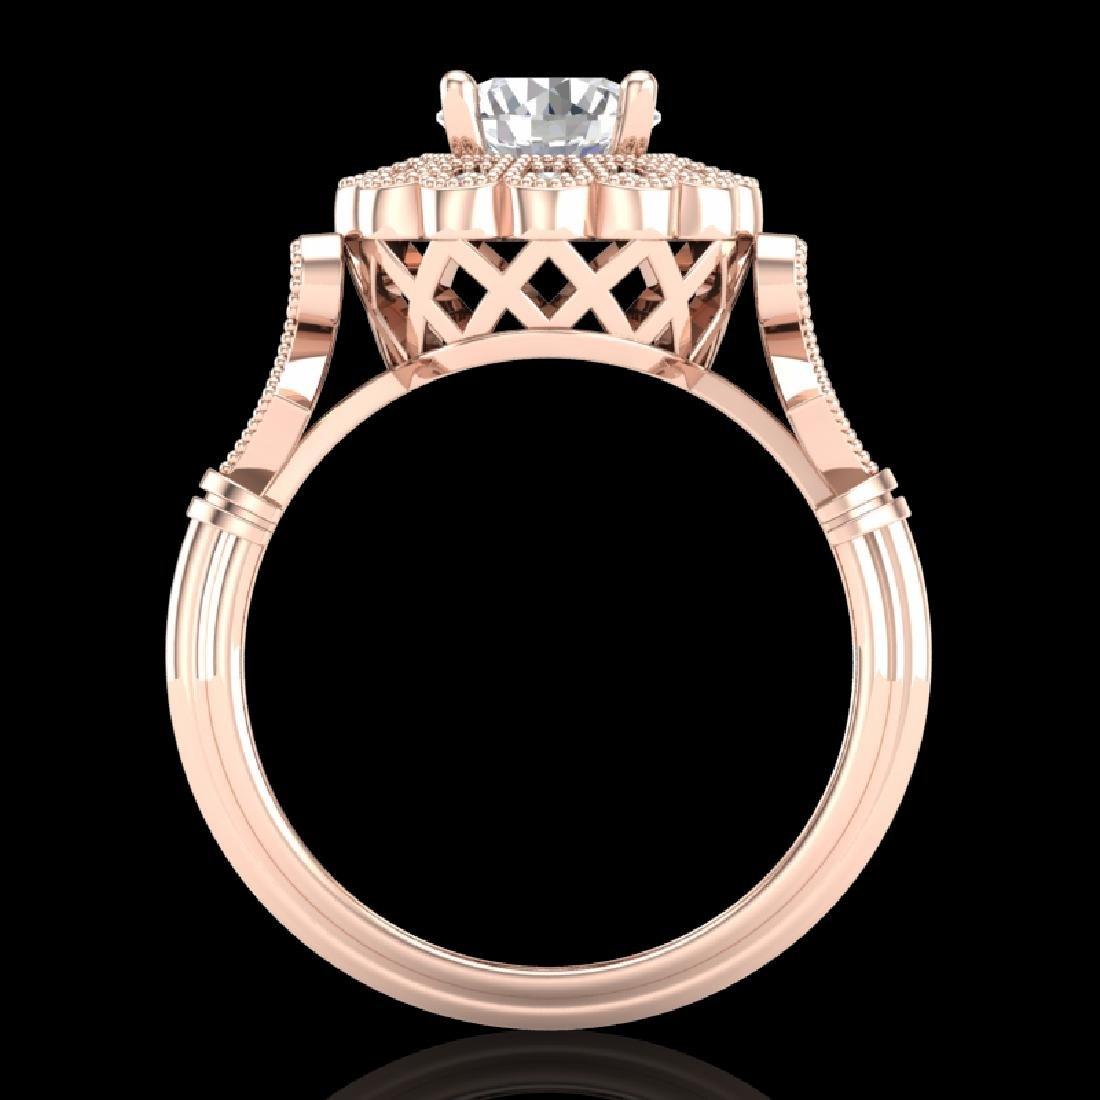 1.2 CTW VS/SI Diamond Solitaire Art Deco Ring 18K Rose